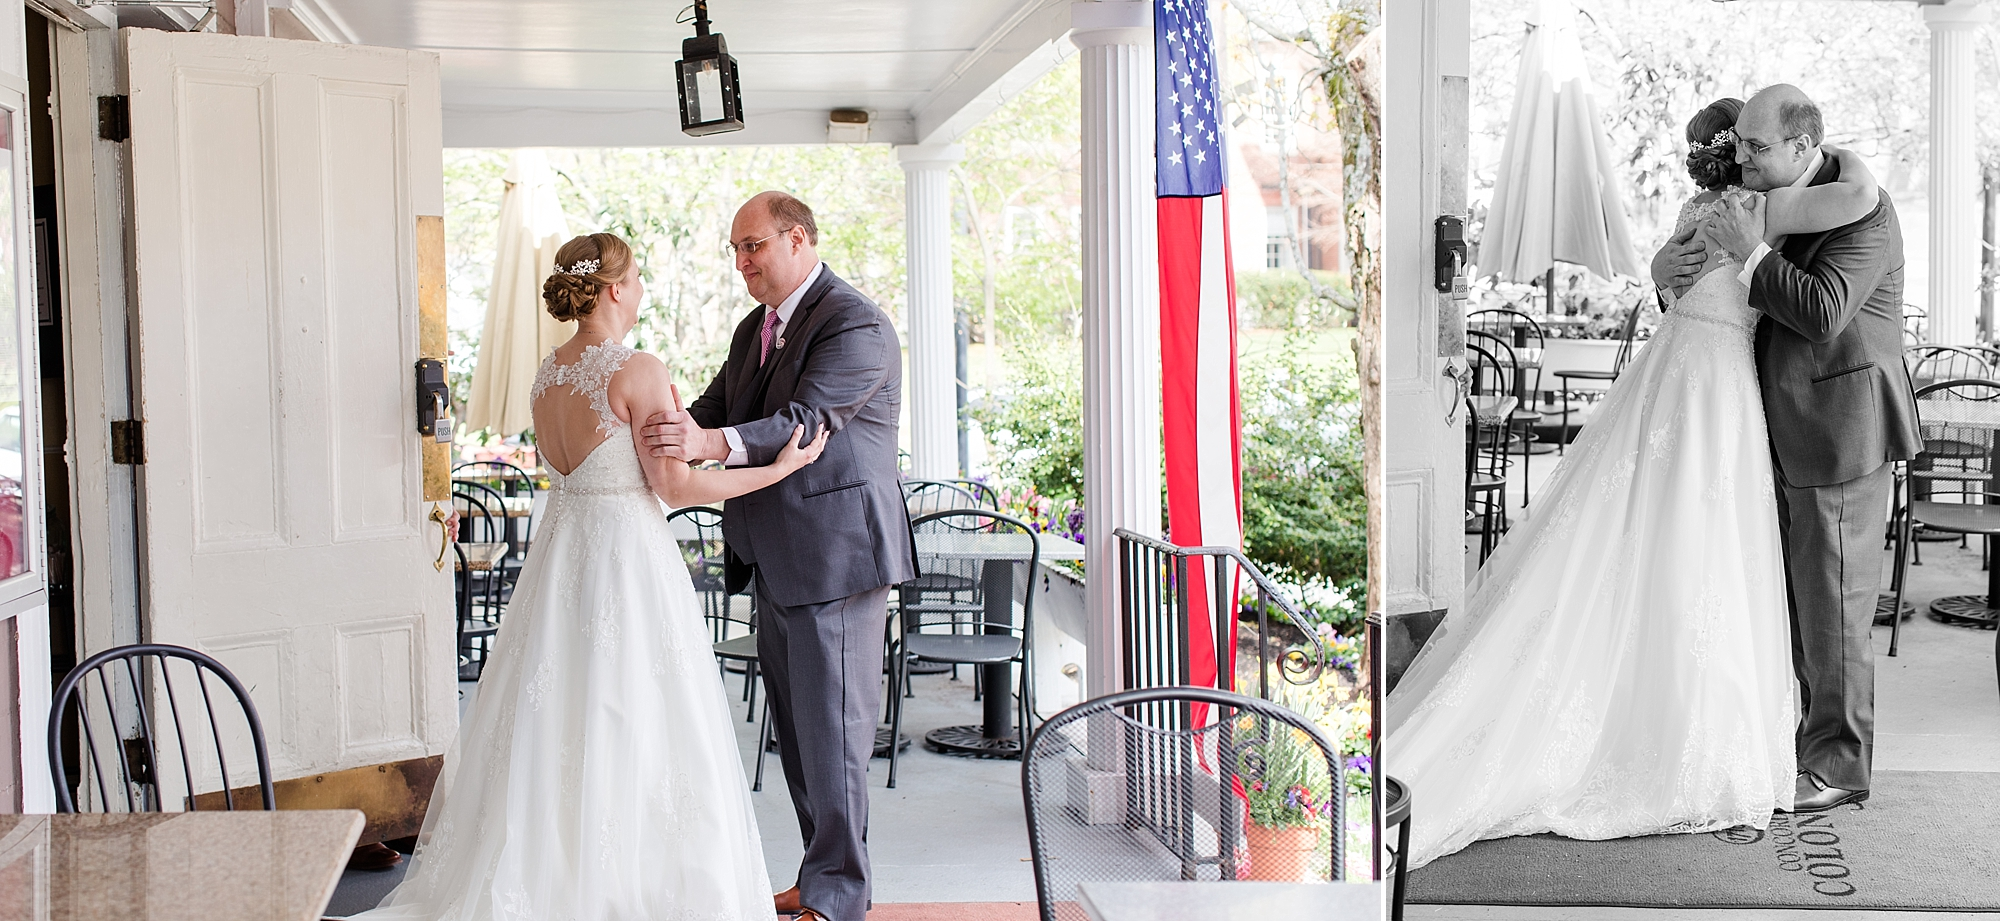 eisleyimages-concordcolonialinn-wedding_0061.jpg